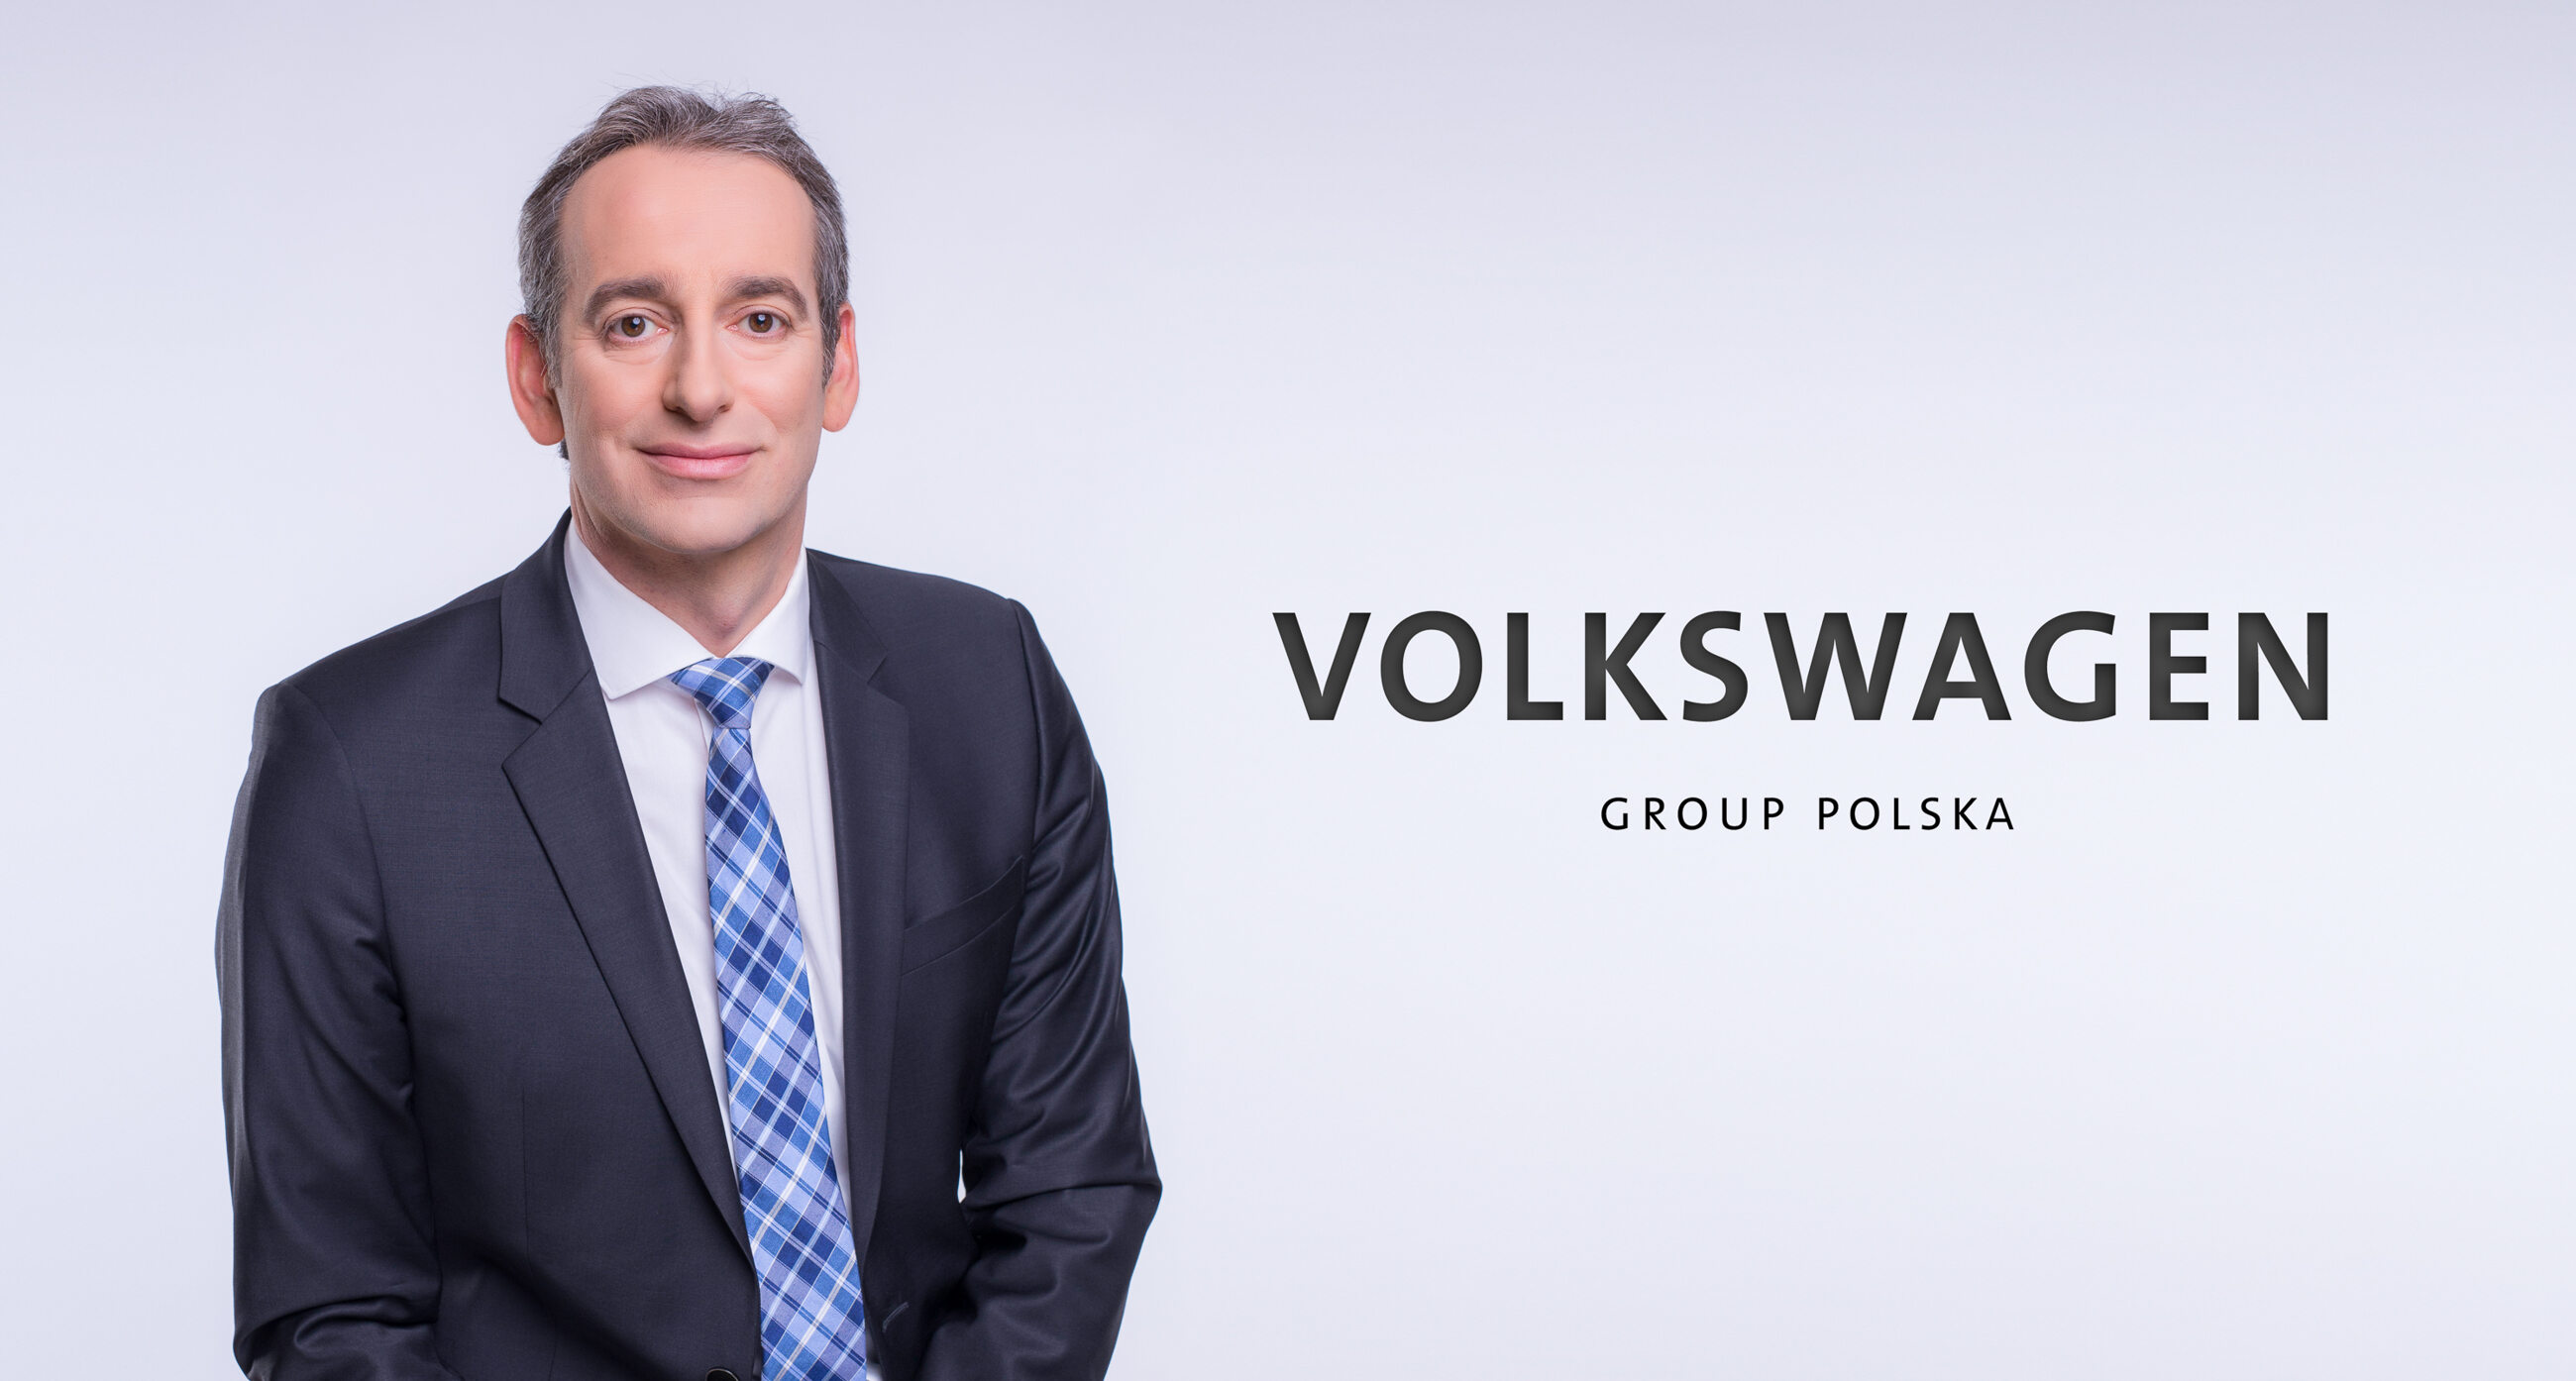 dr Wolf-Stefan Specht, Prezes Zarządu Volkswagen Group Polska